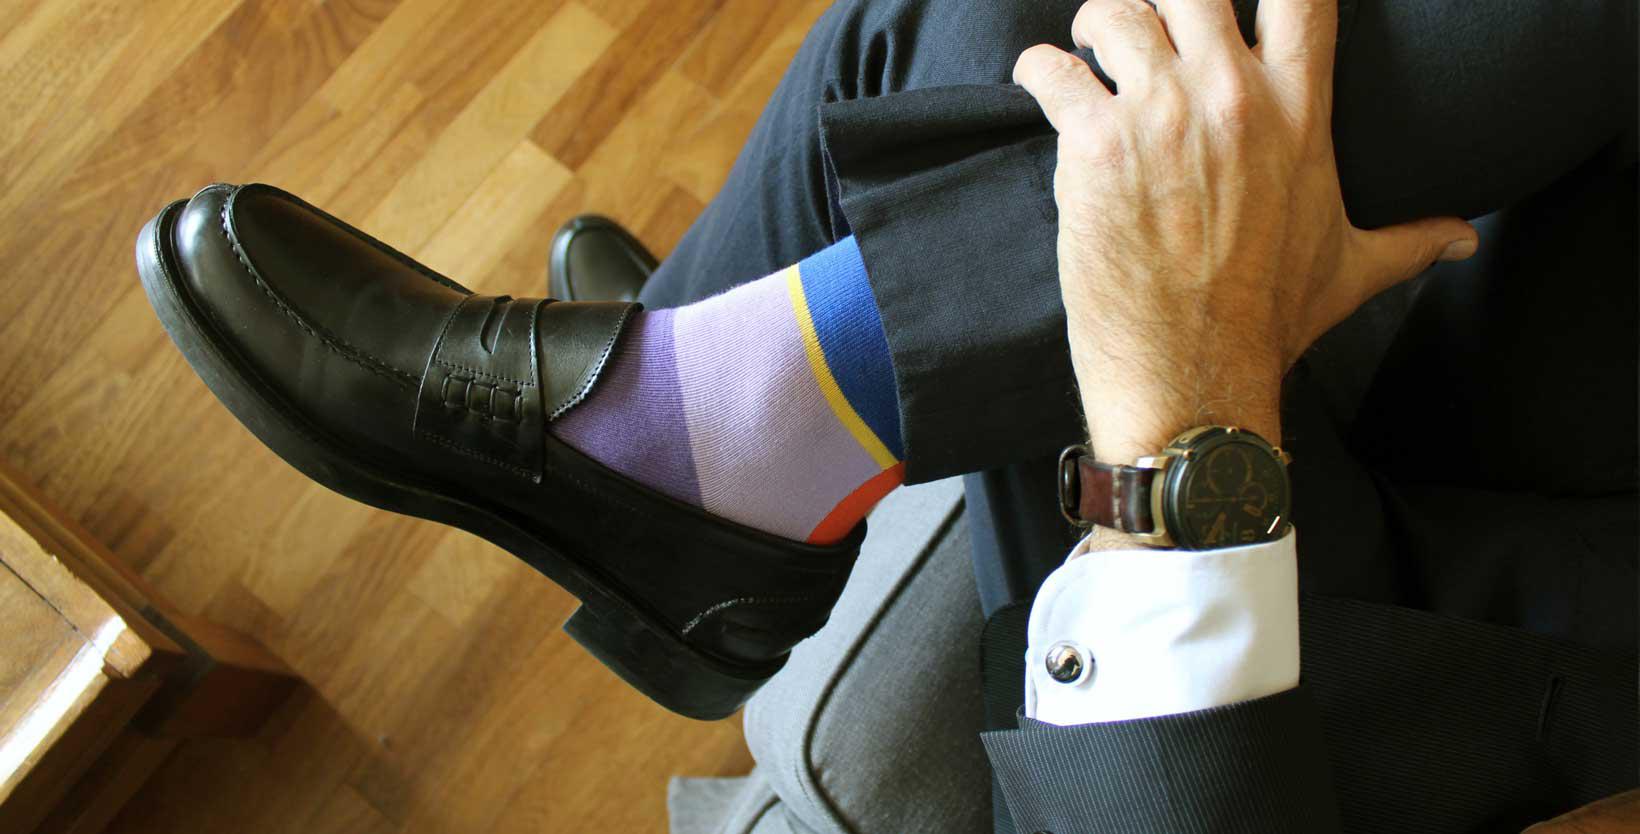 Funky socks during job interviews